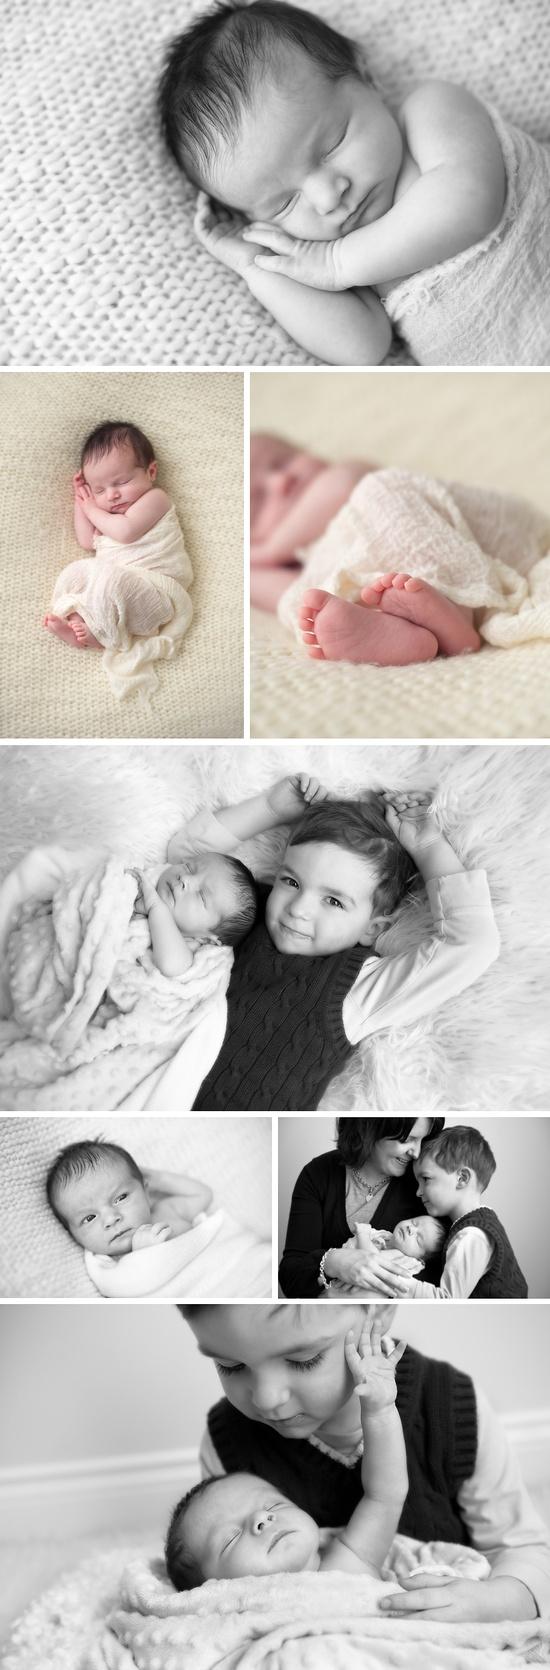 siblings, newborn photos